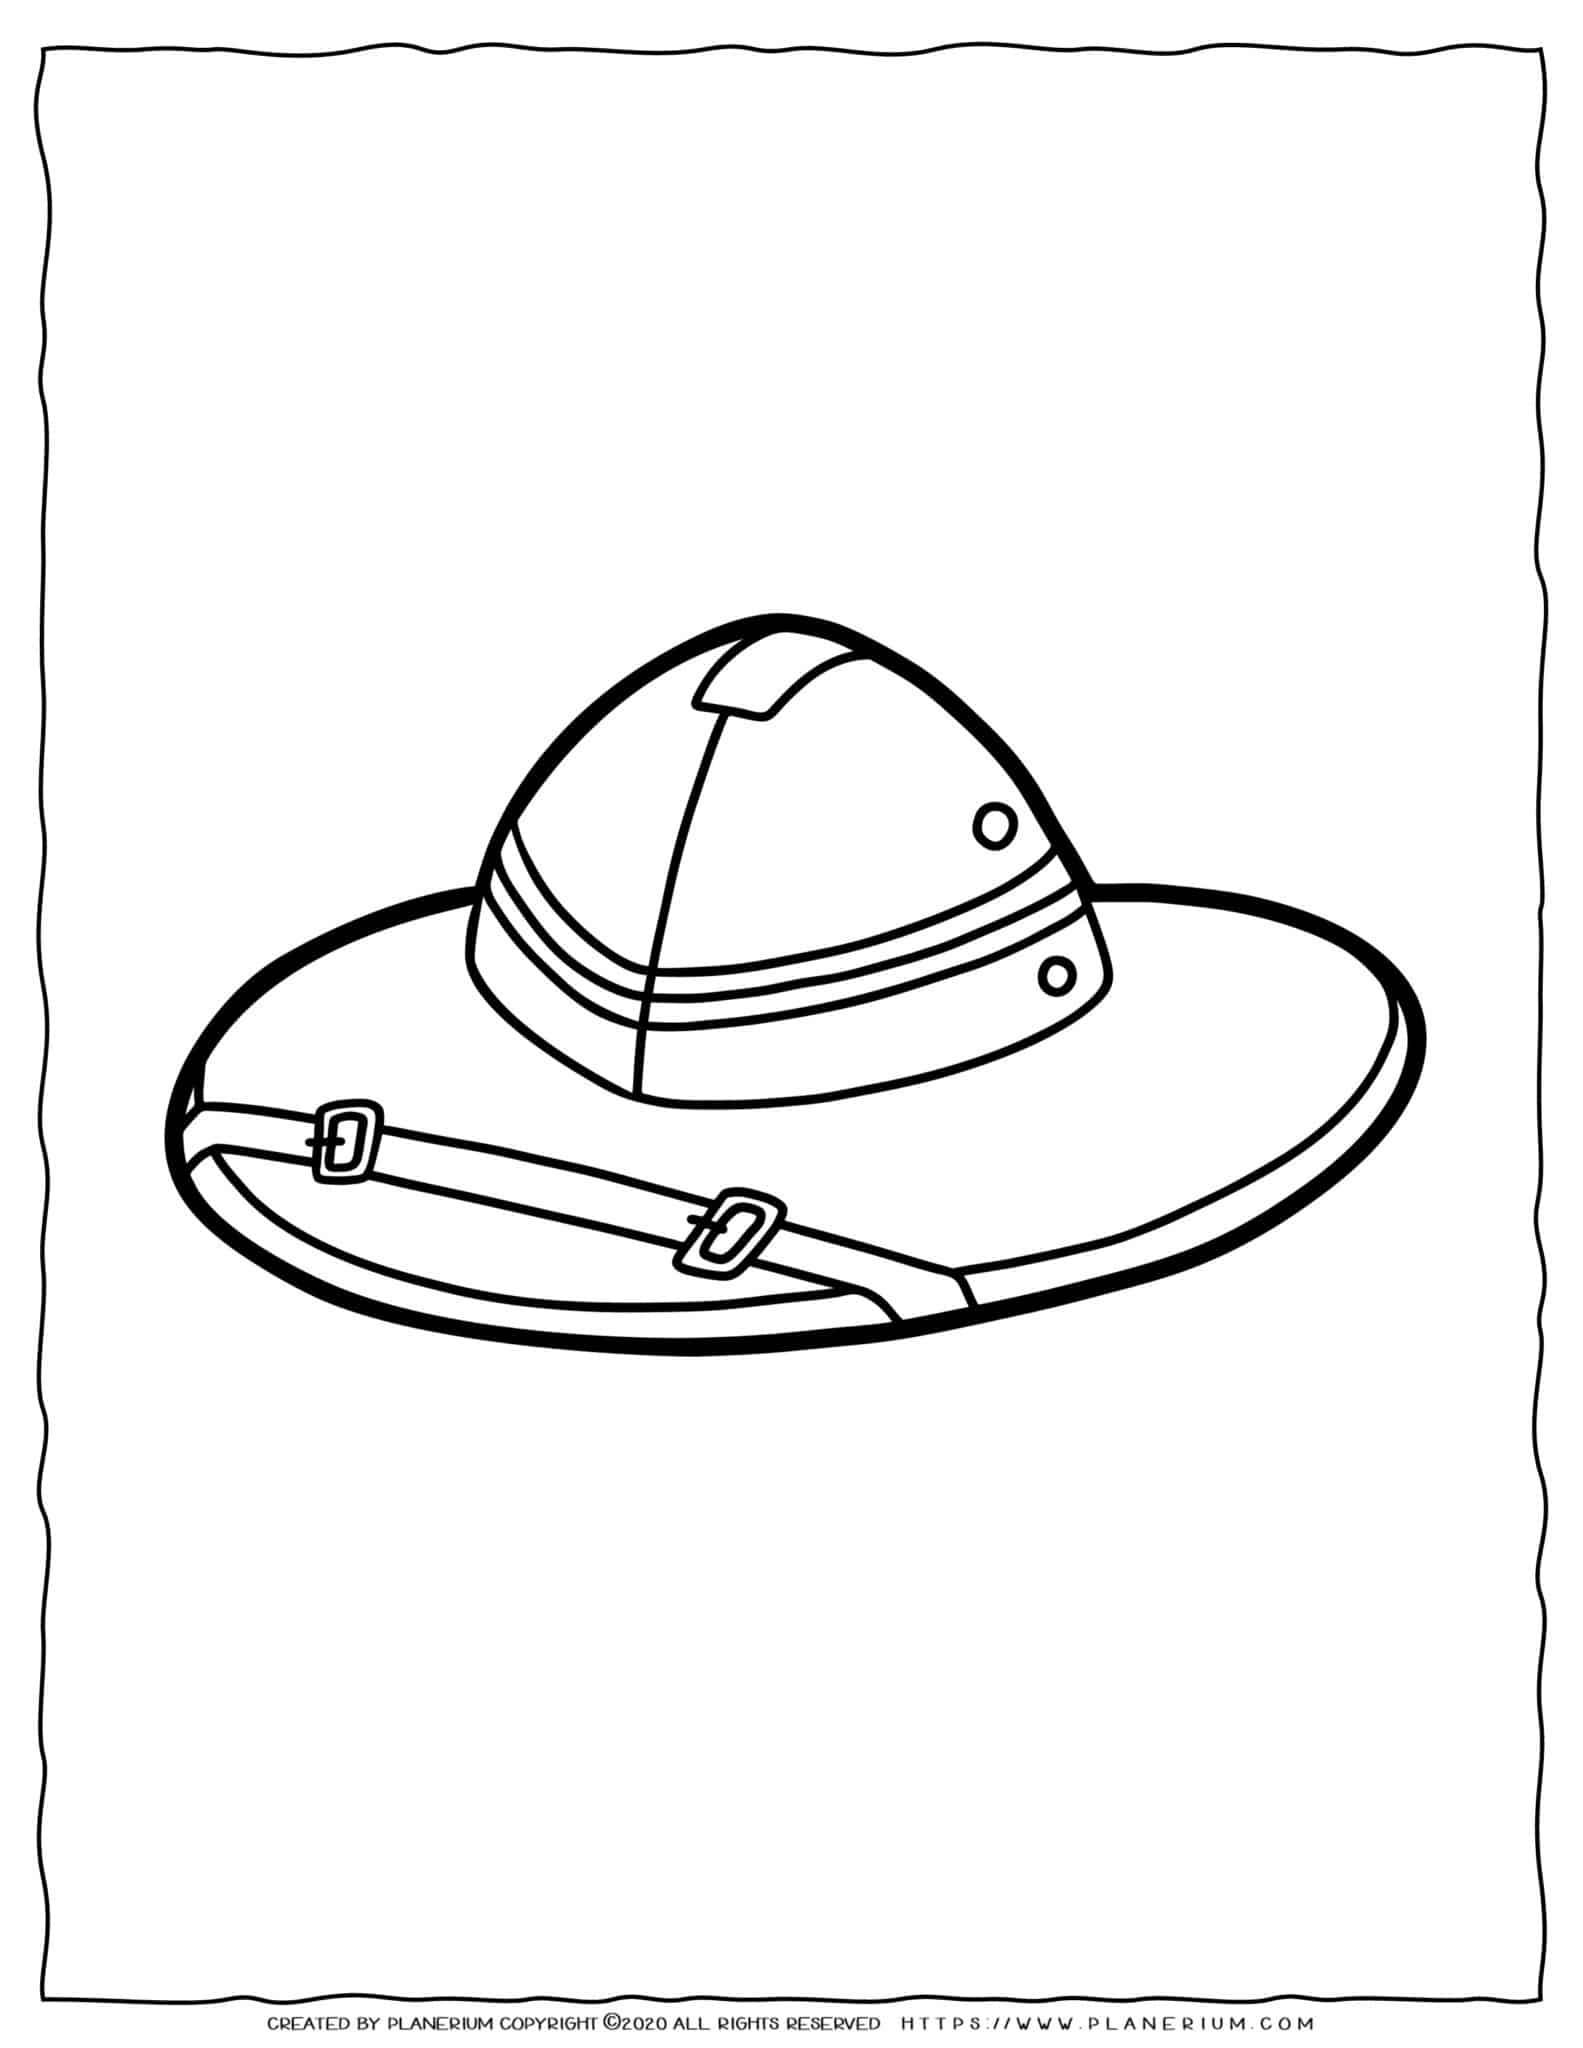 Clothes Coloring Page - Travel Hat   Planerium